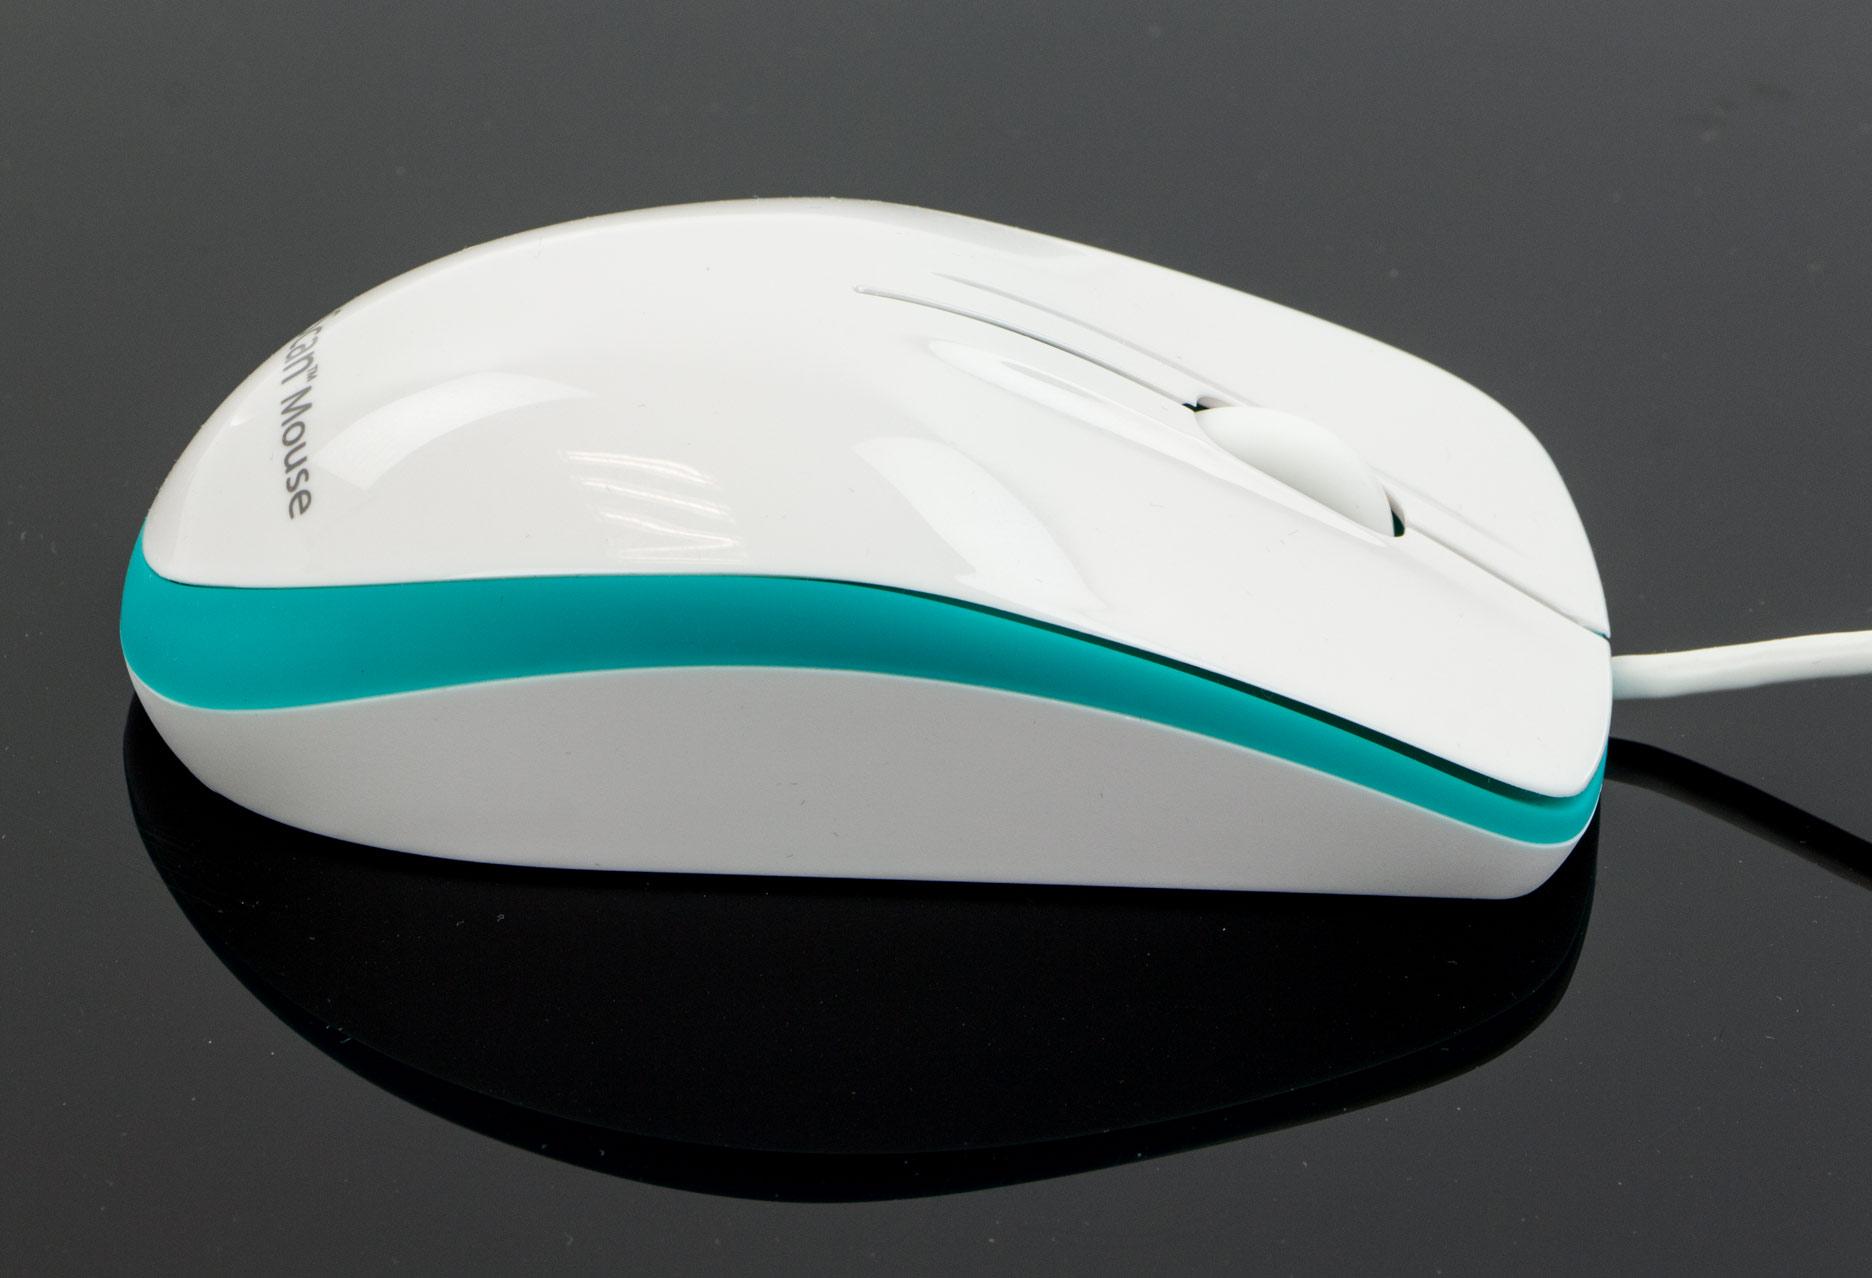 IRIScan Mouse Executive 2 prawy bok